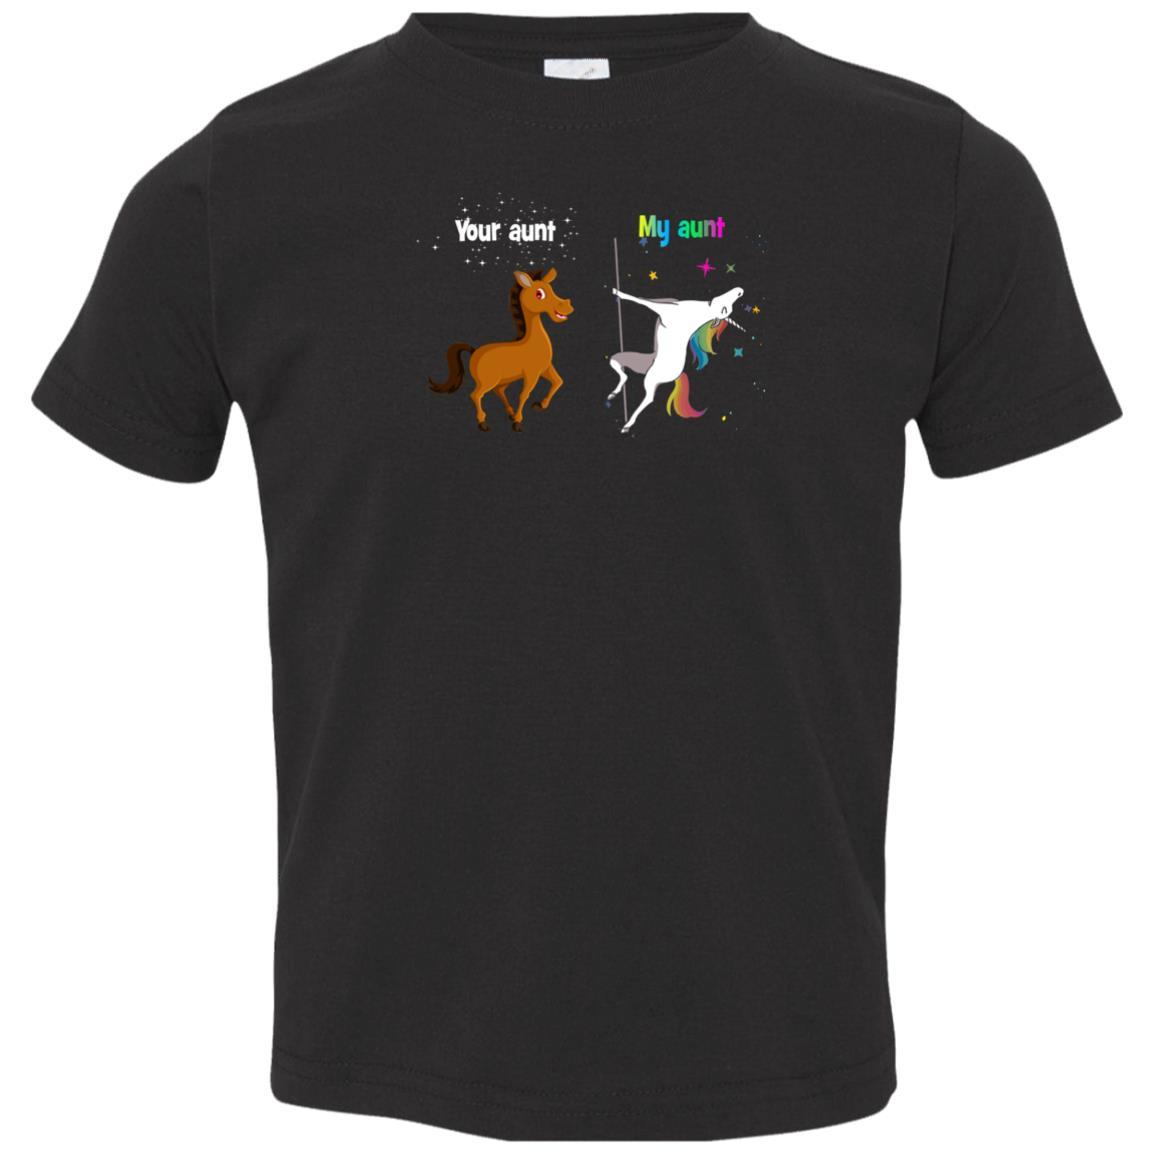 image 955px My aunt unicorn vs your aunt horse youth t shirt